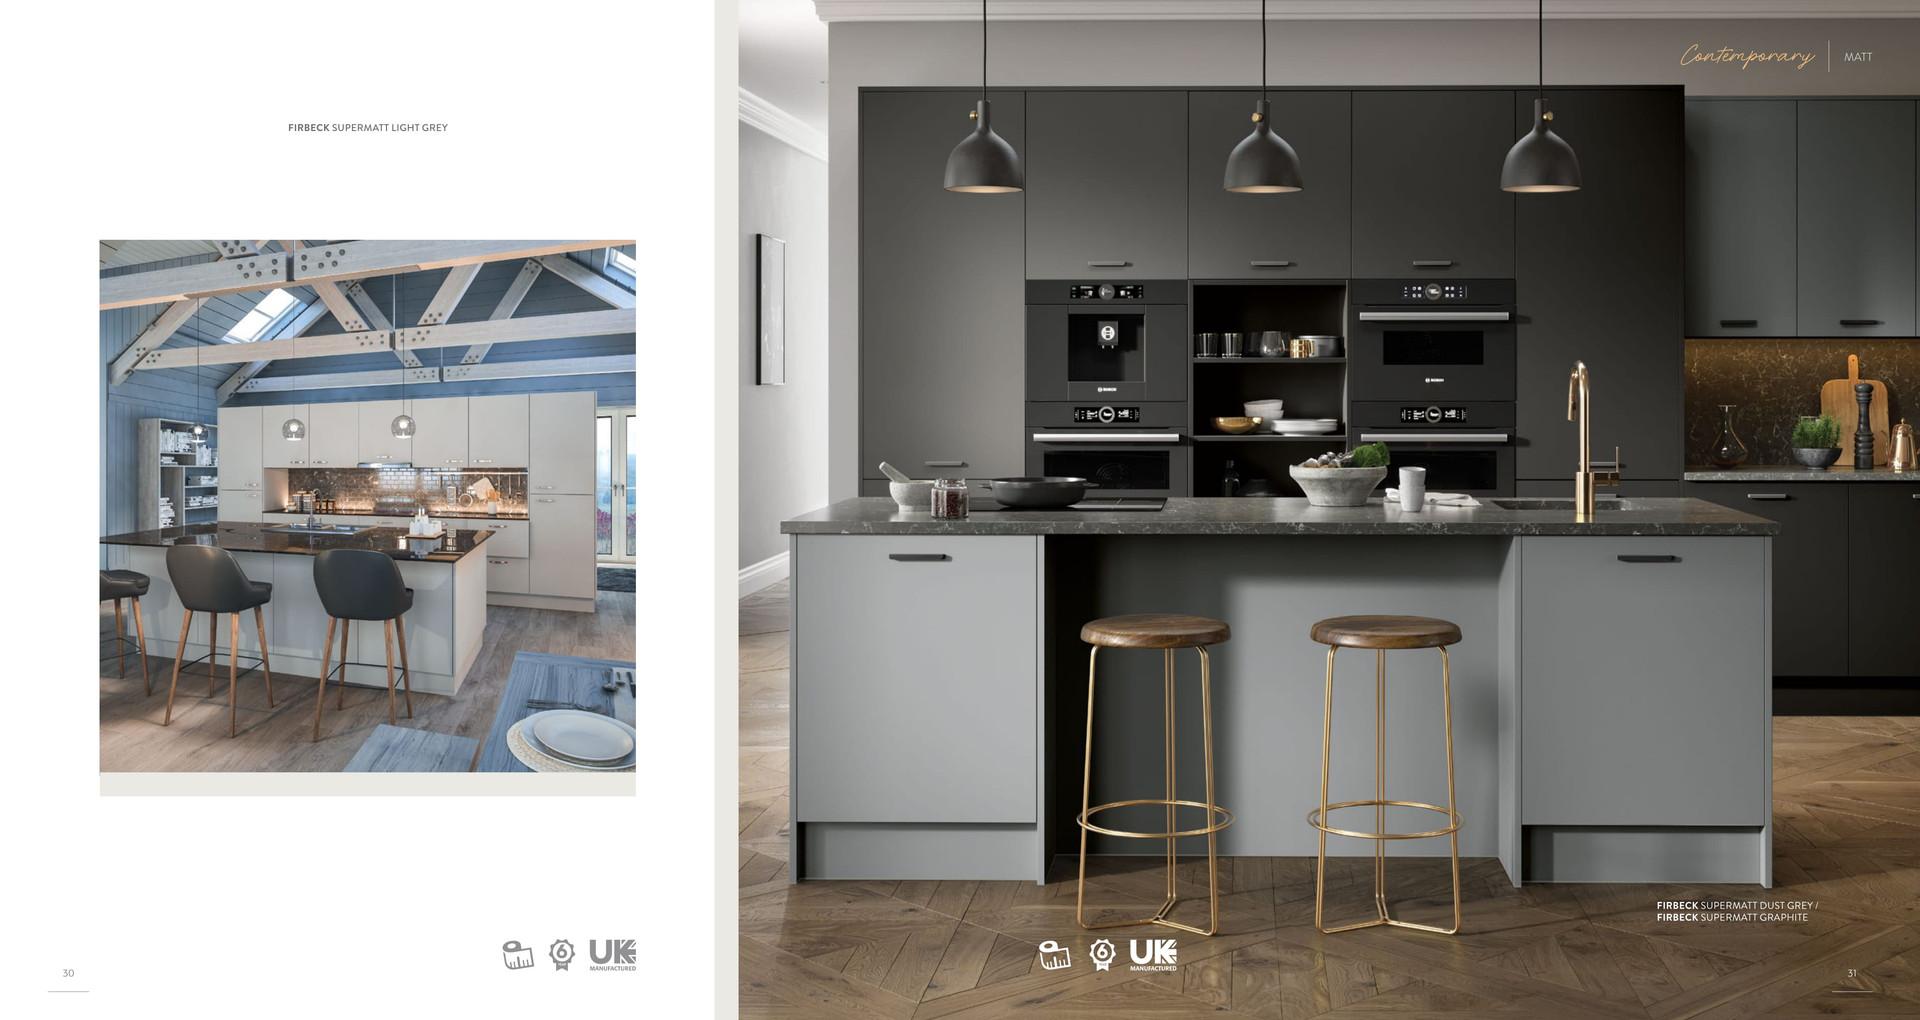 blossom-avenue-kitchen-brochure-2020-16.